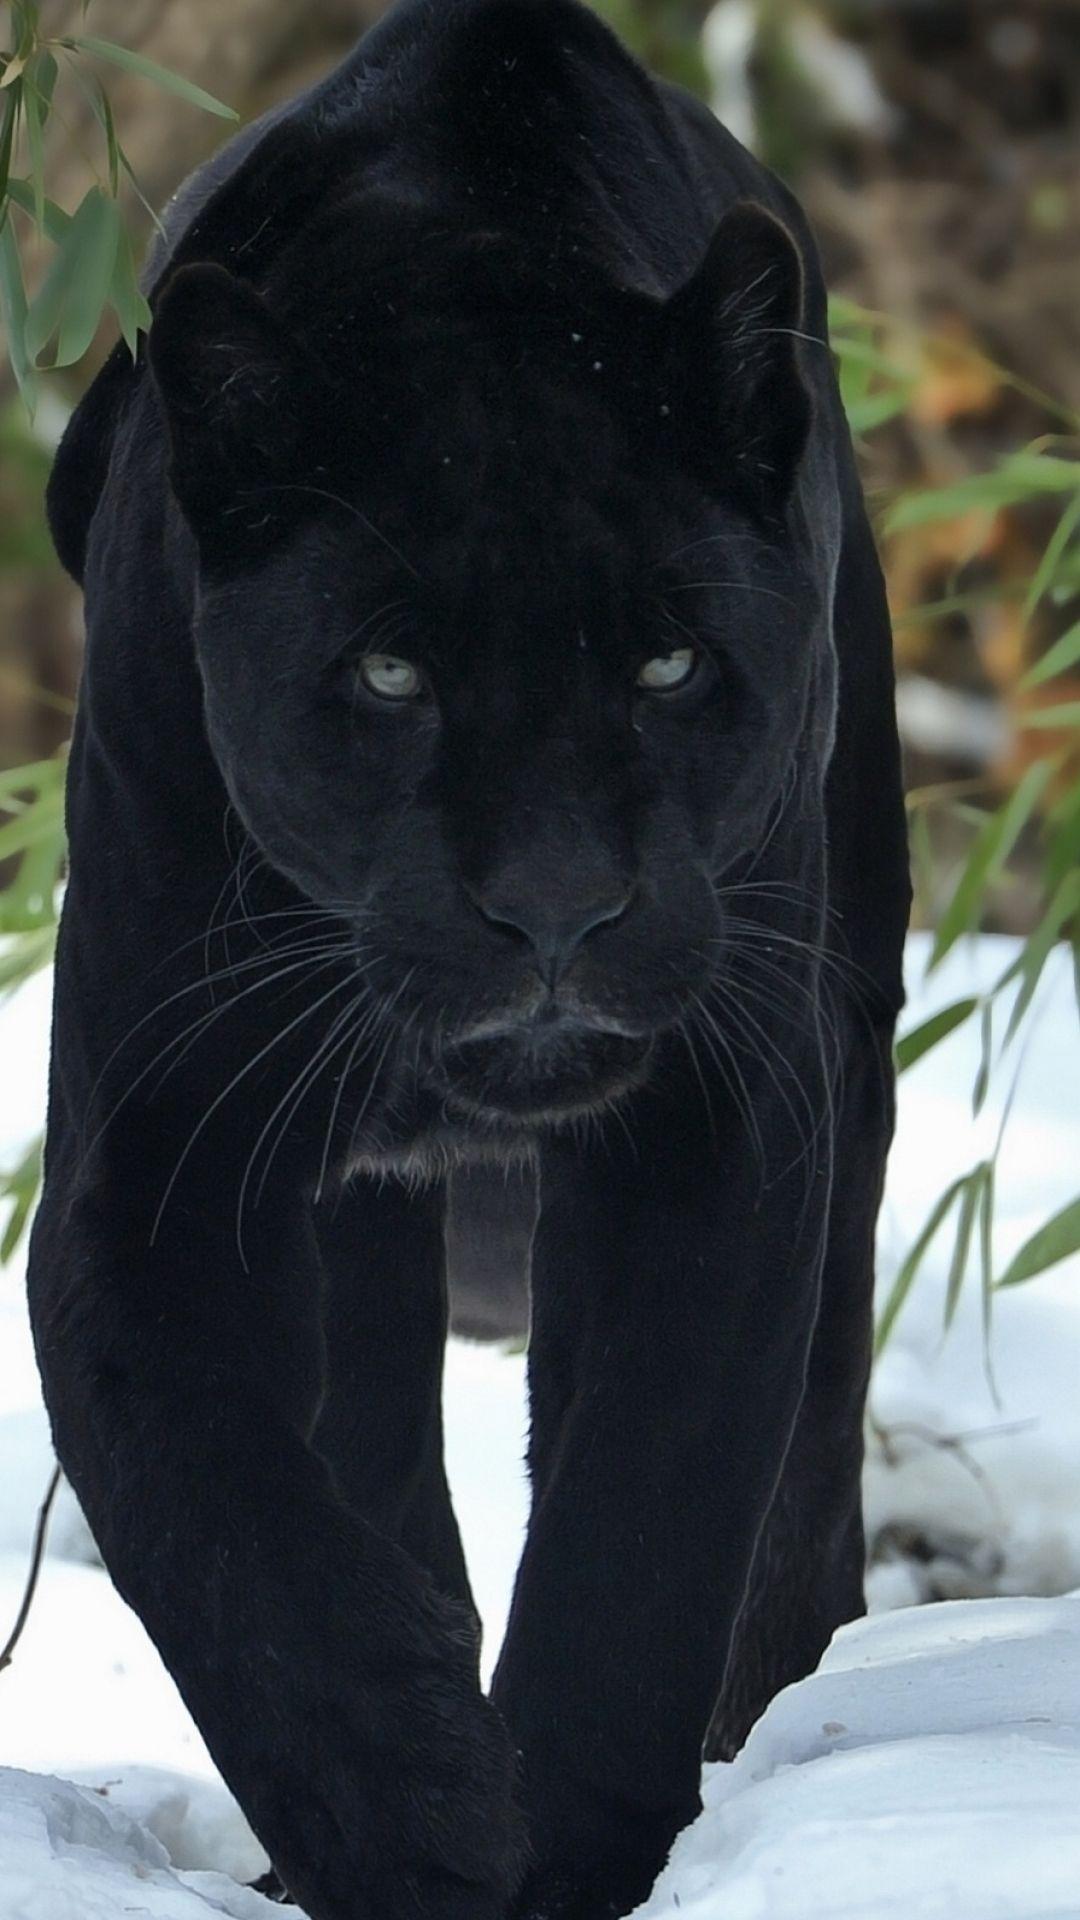 Animal Black Panther Cats Mobile Wallpaper Panther cat